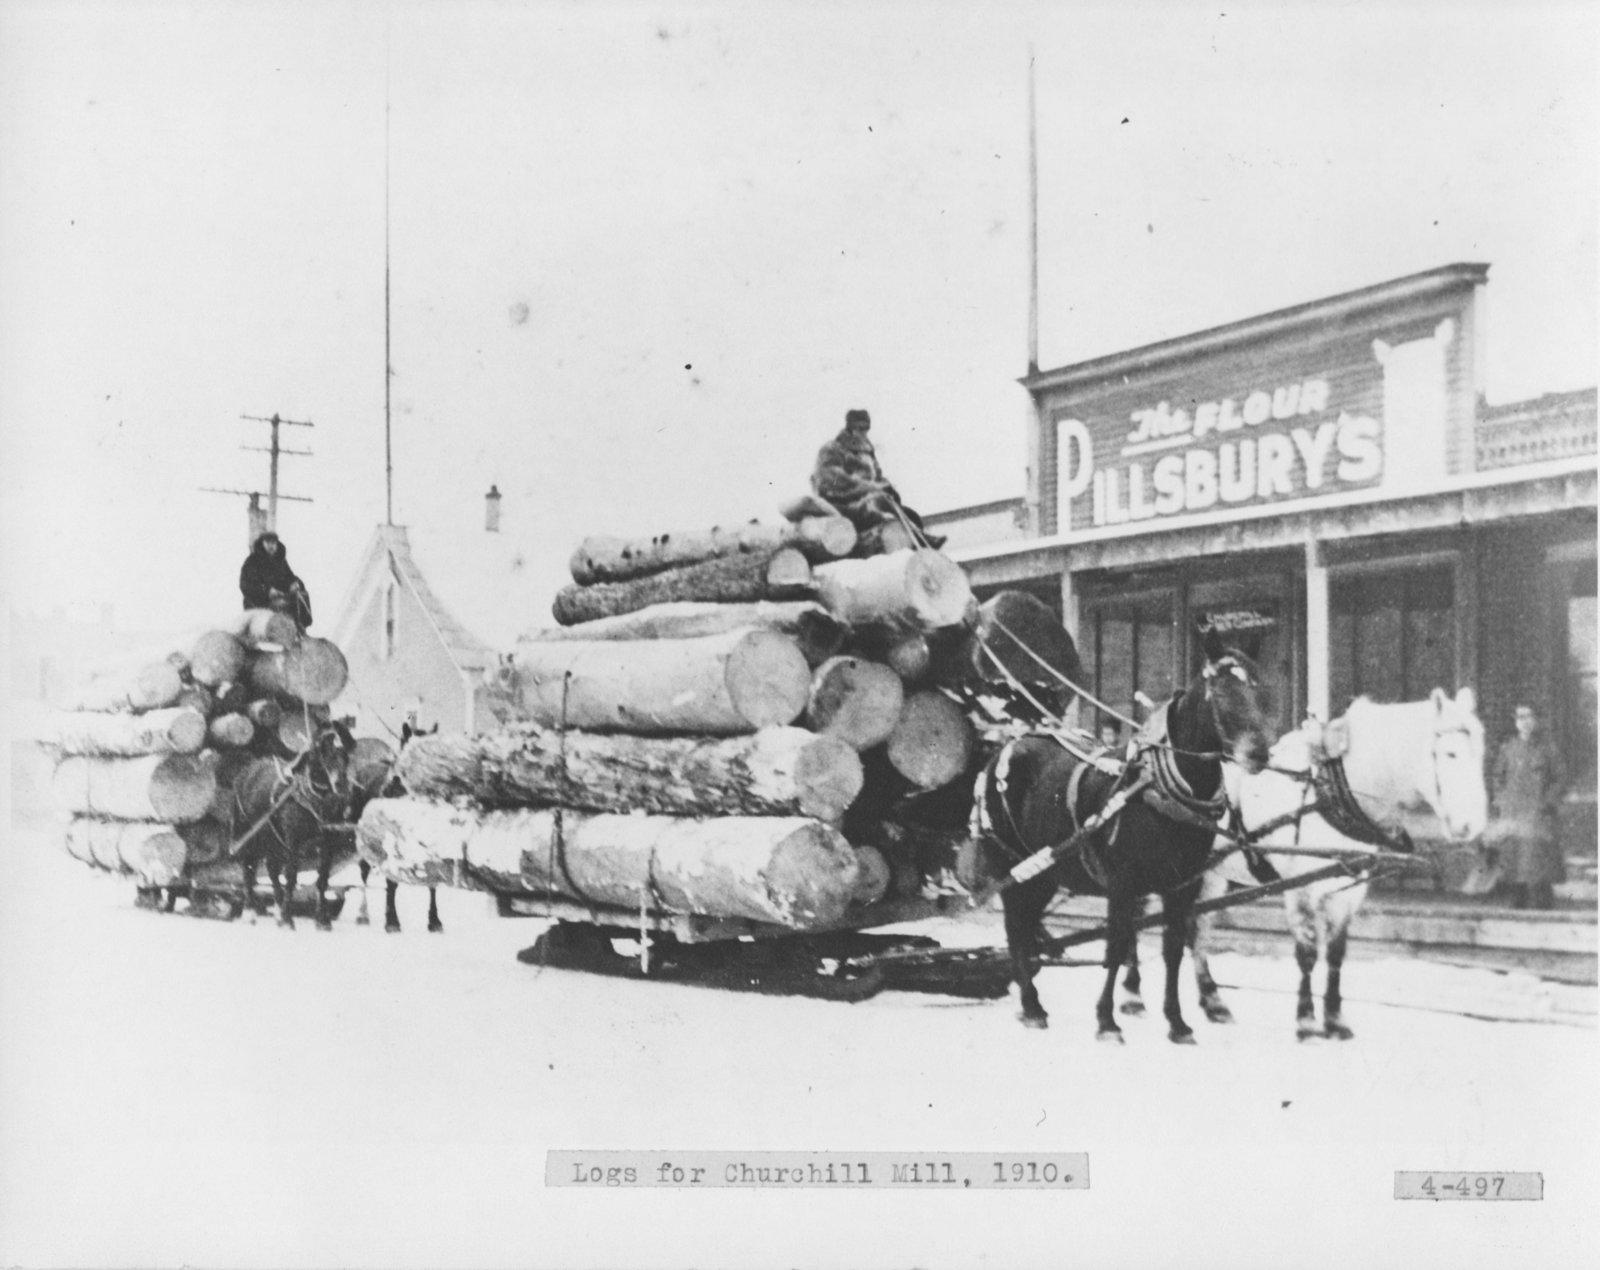 Logs for Churchill Mill